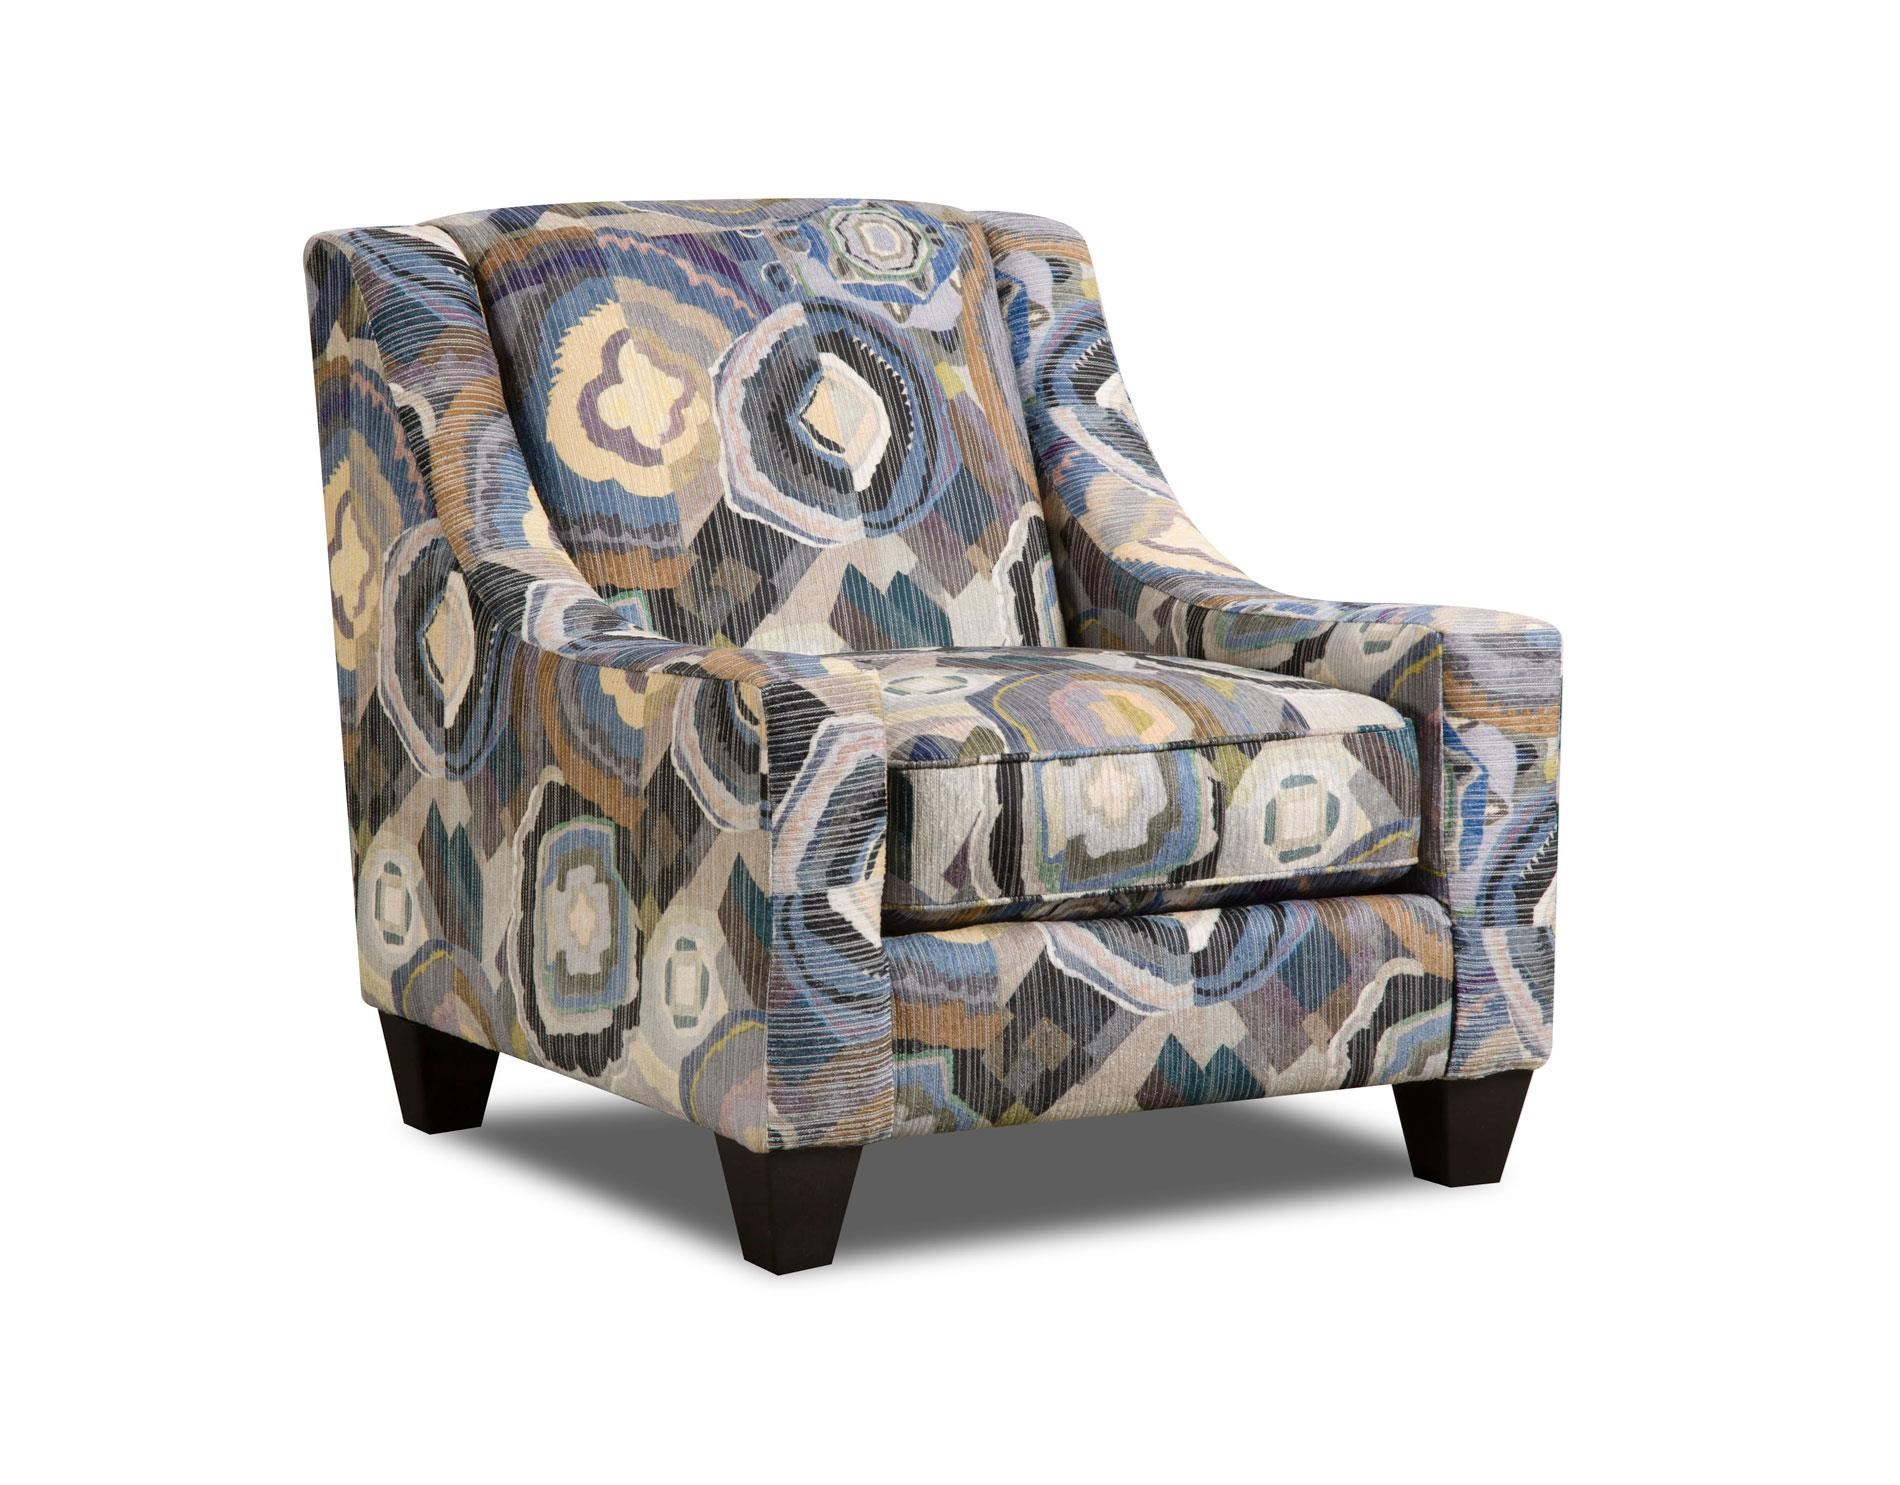 Corinthian Paradigm Admiral Patchquilt Cornflower Accent Chair - Item Number: AC2060